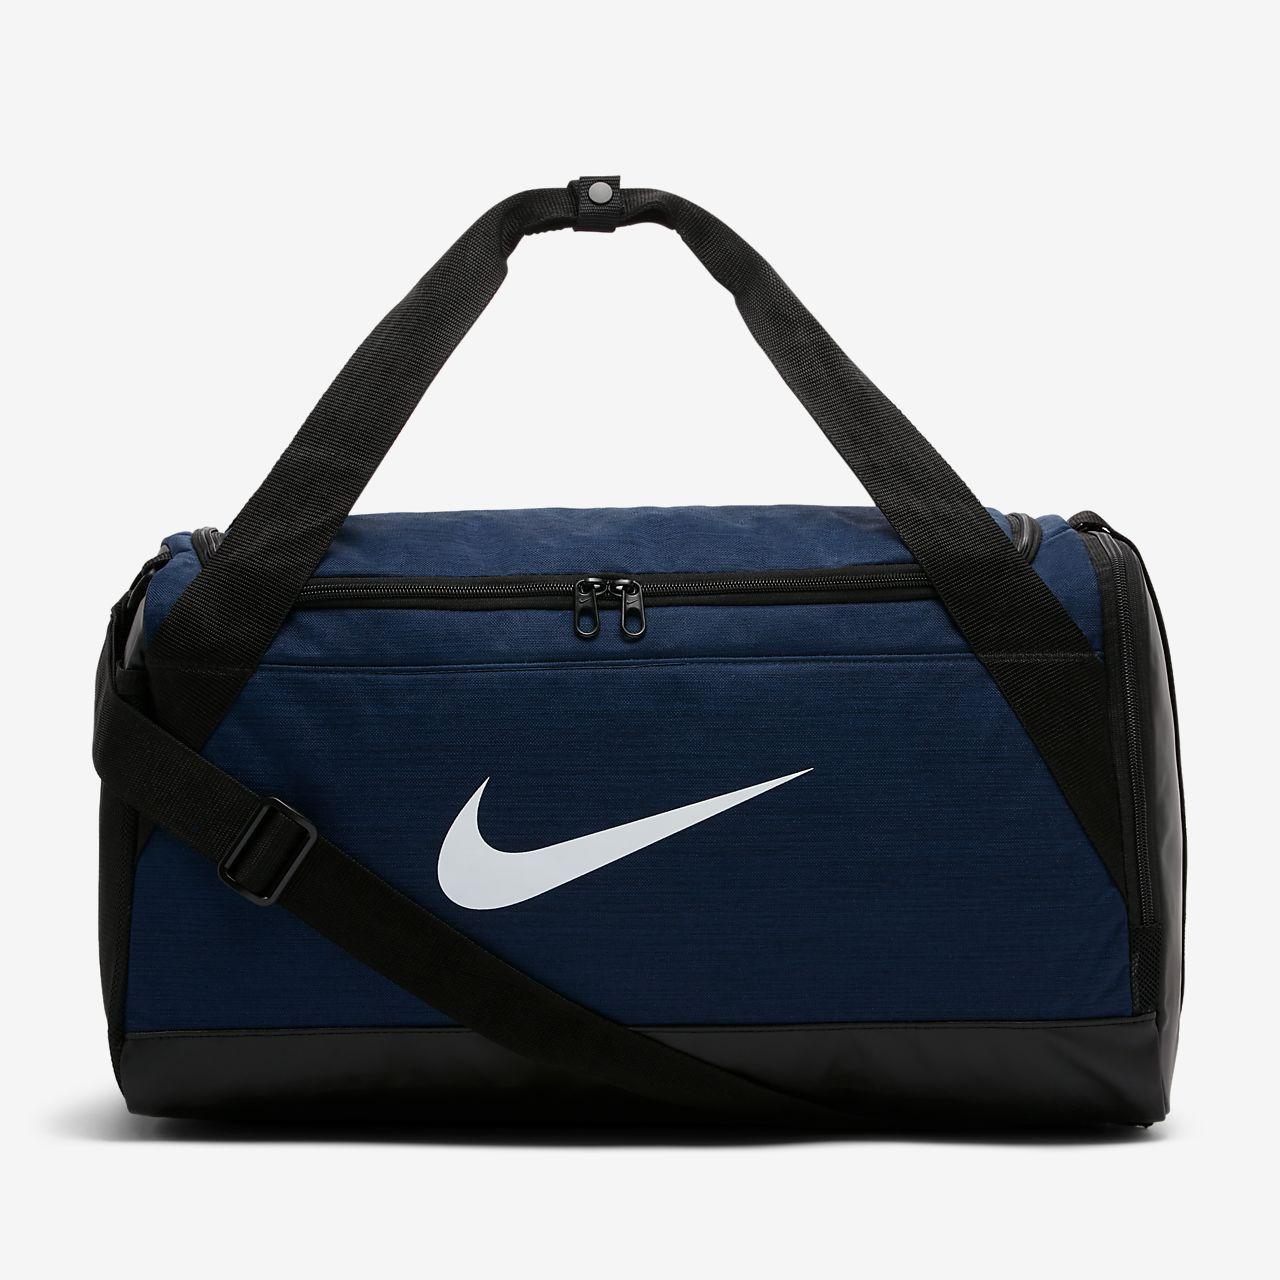 Sac Nike De Sport Brasiliapetite Training TailleFr fgY7b6y